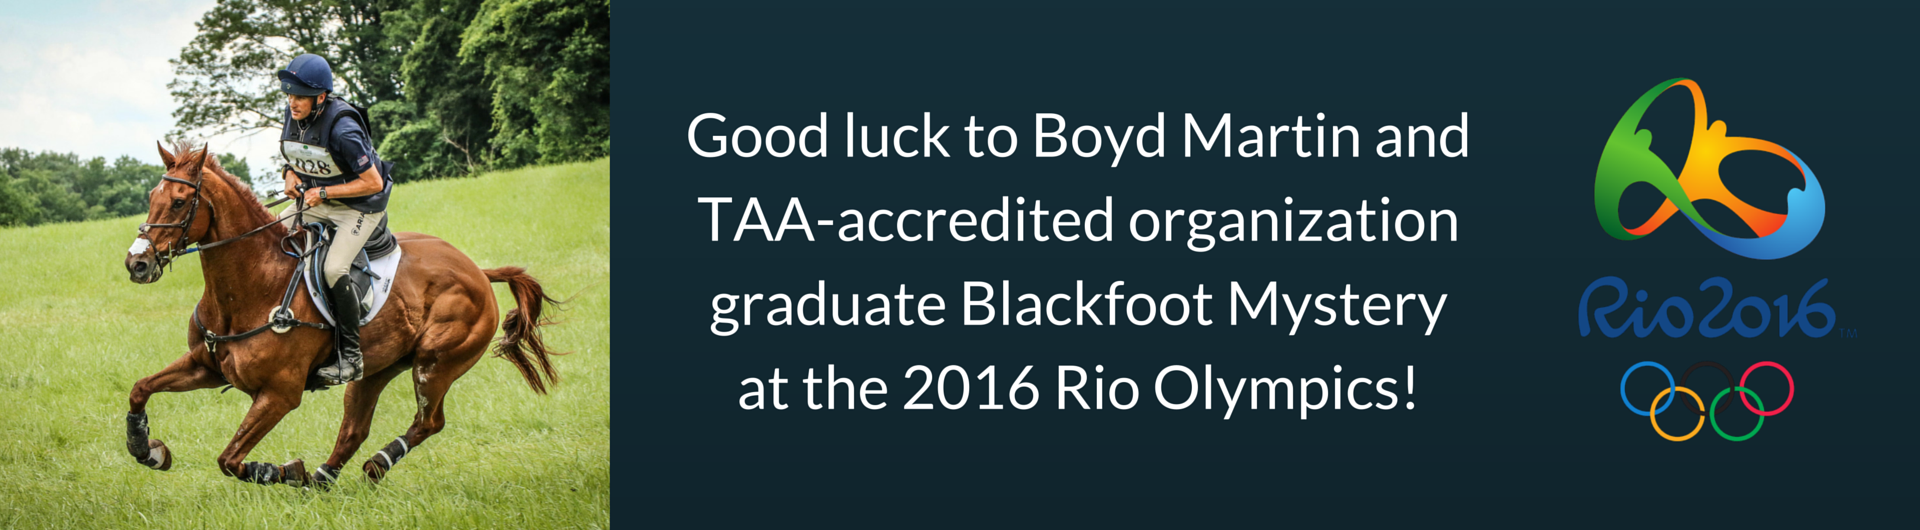 Boyd Martin Blackfoot Mystery Olympics